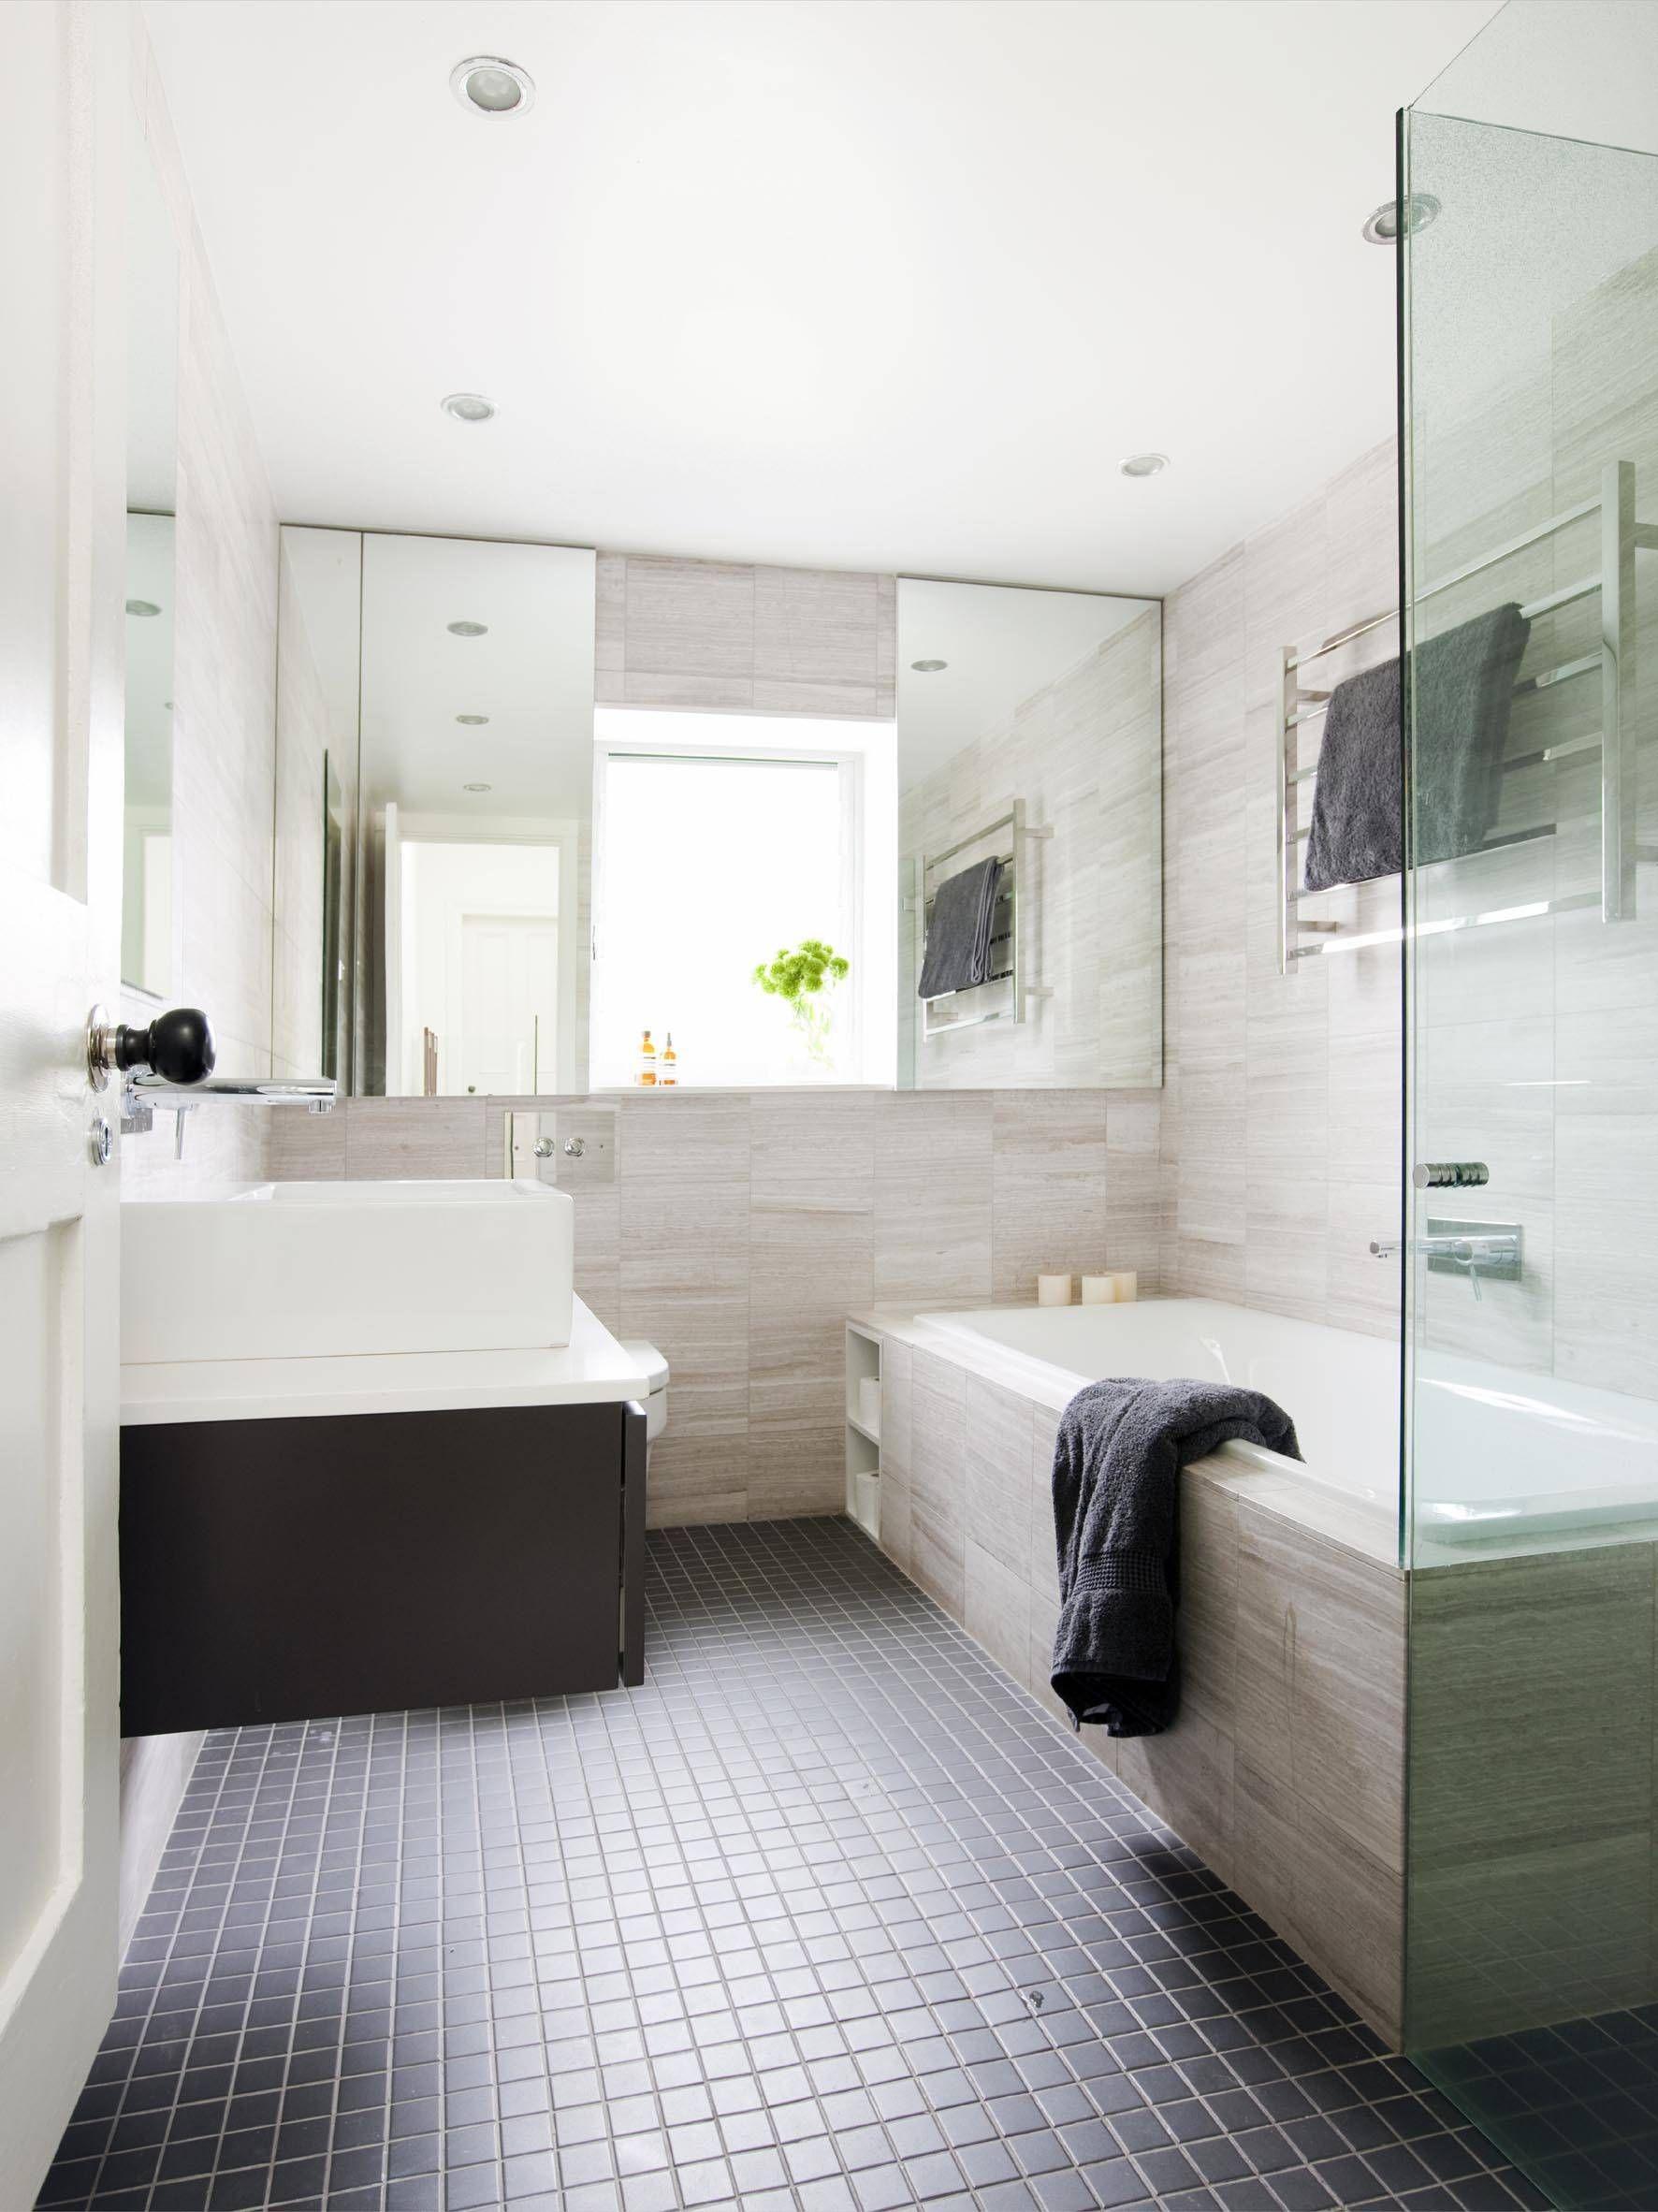 renovated bathrooms fresh bathroom new bathroom remodel on bathroom renovation ideas diy id=20473